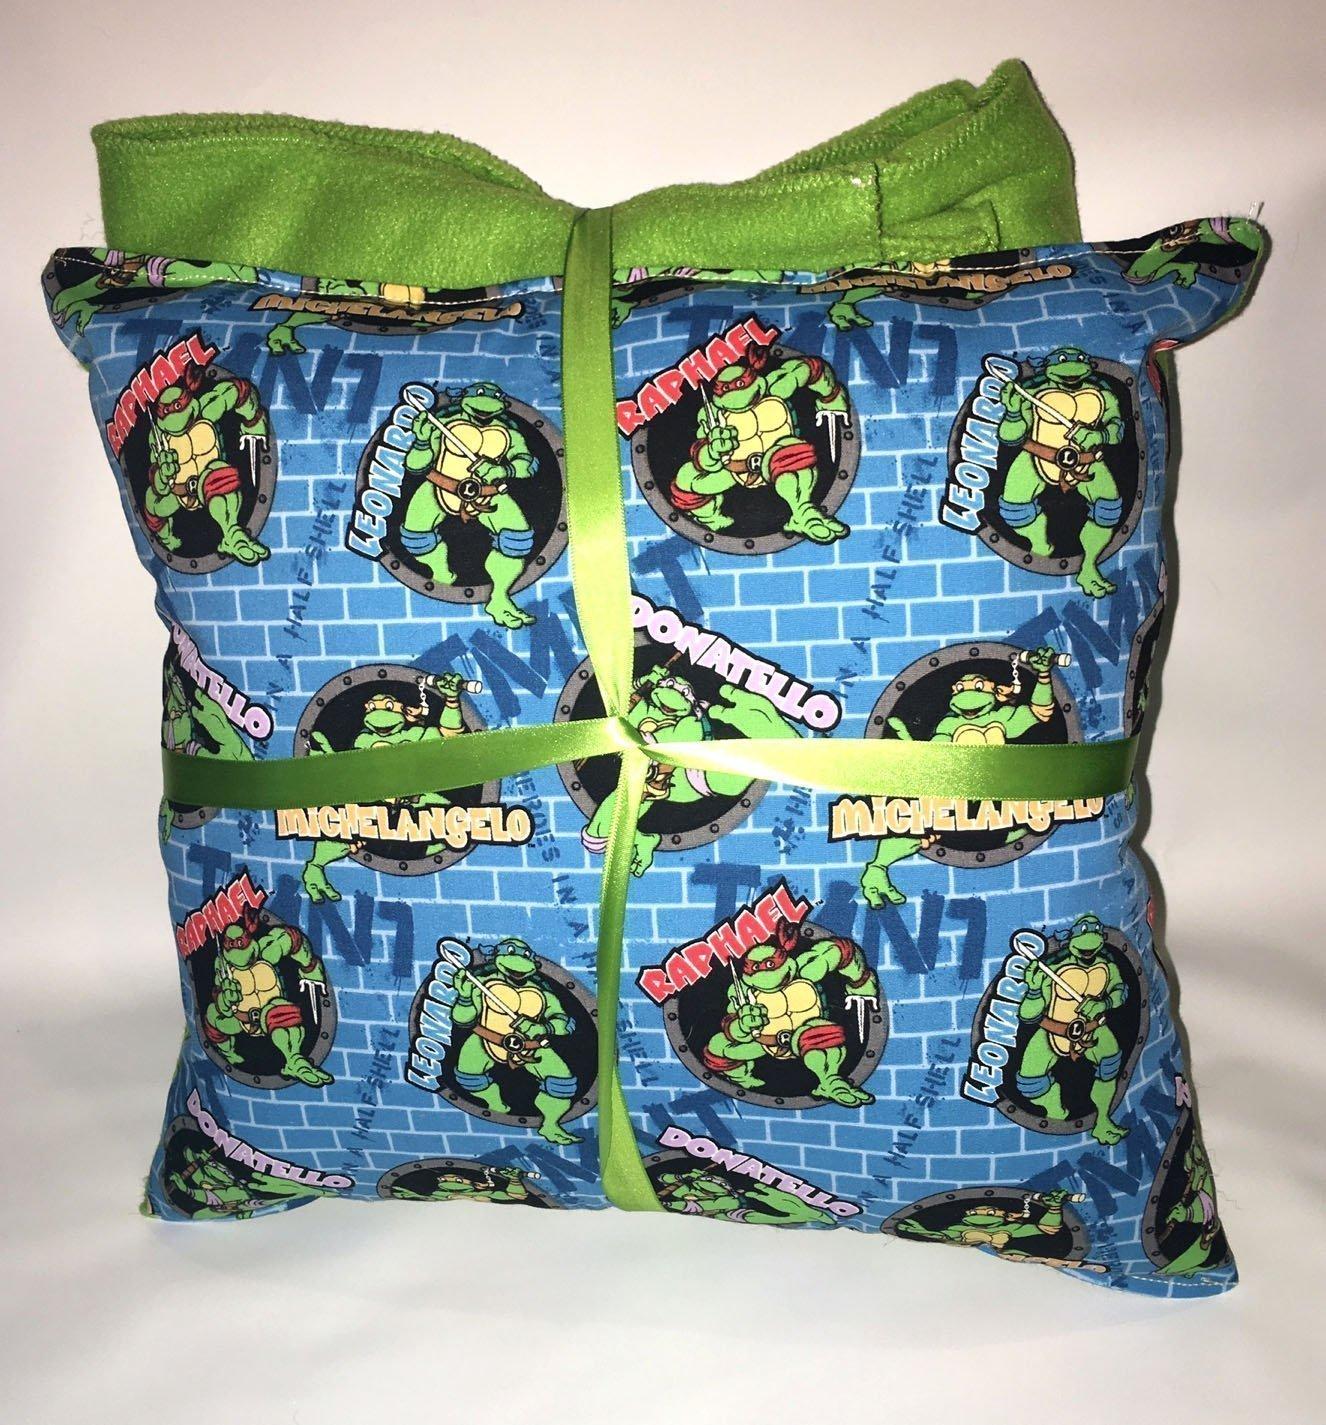 TMNT Pillow And Blanket Teenage Mutant Ninja Turtle Wall Pillow and Blanket Set Handmade In USA